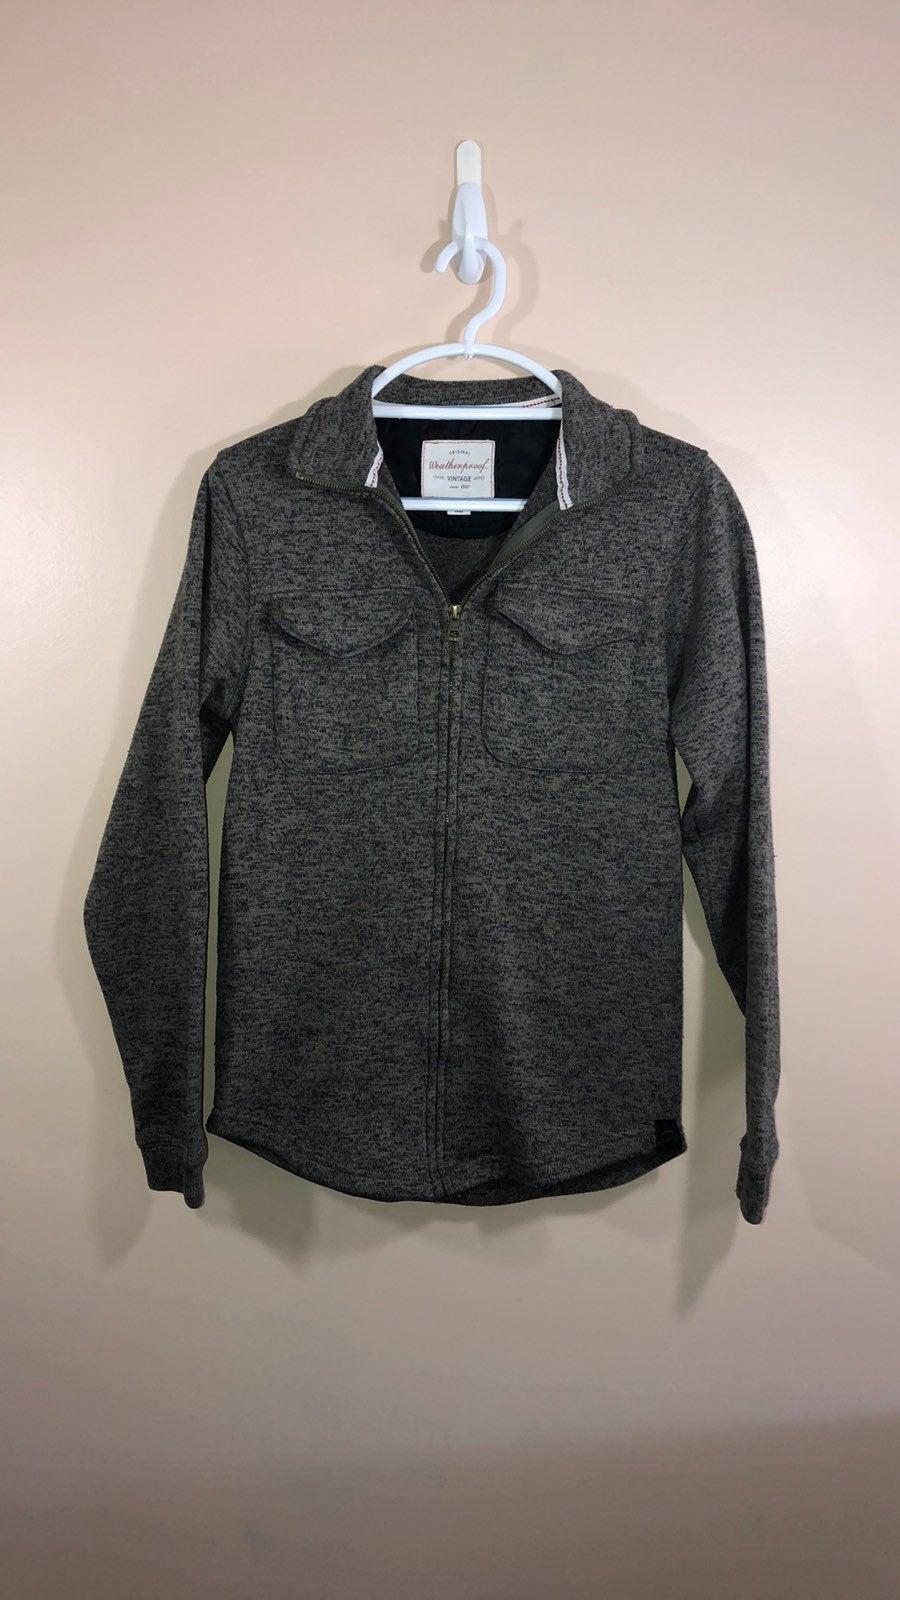 Weatherproof Vintage Zip Up Jacket